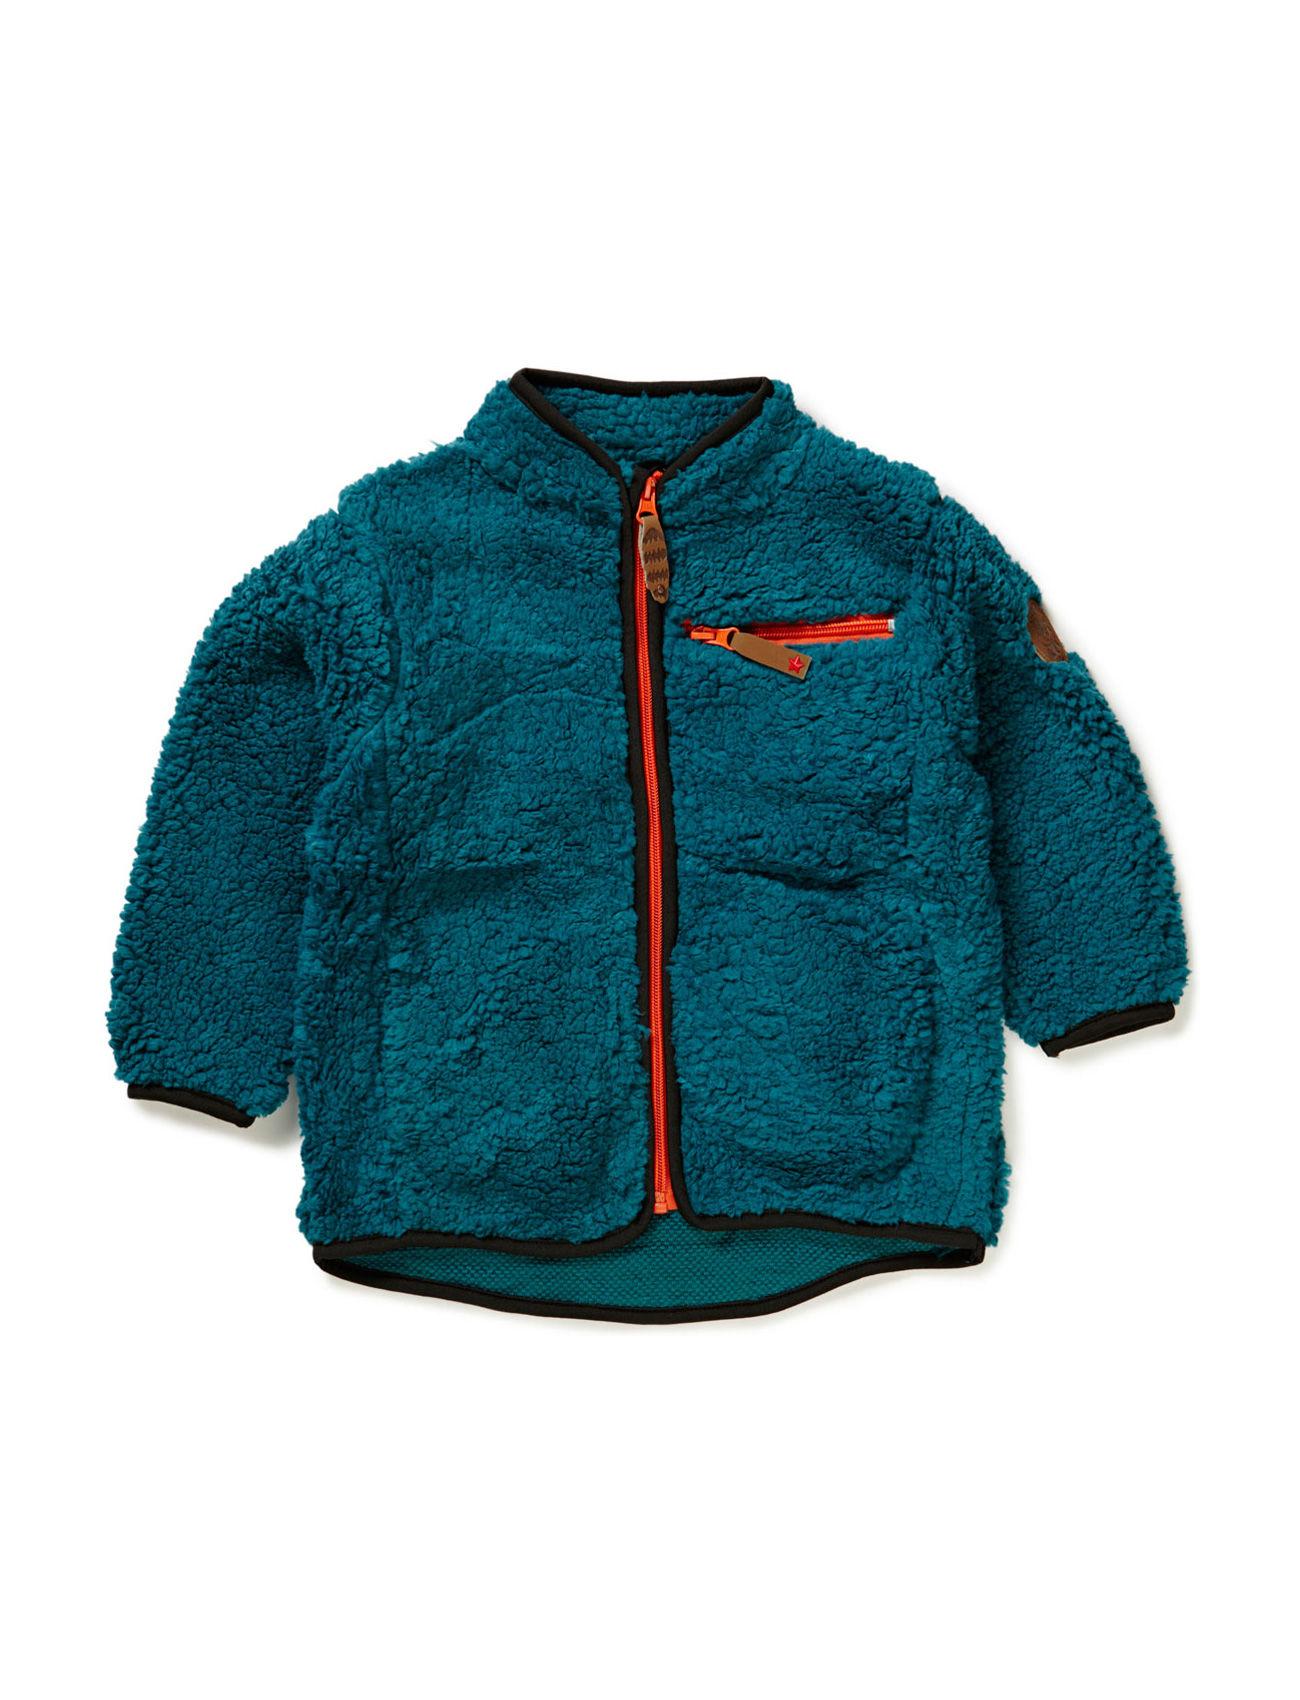 Elmer Teddy Boy Jacket